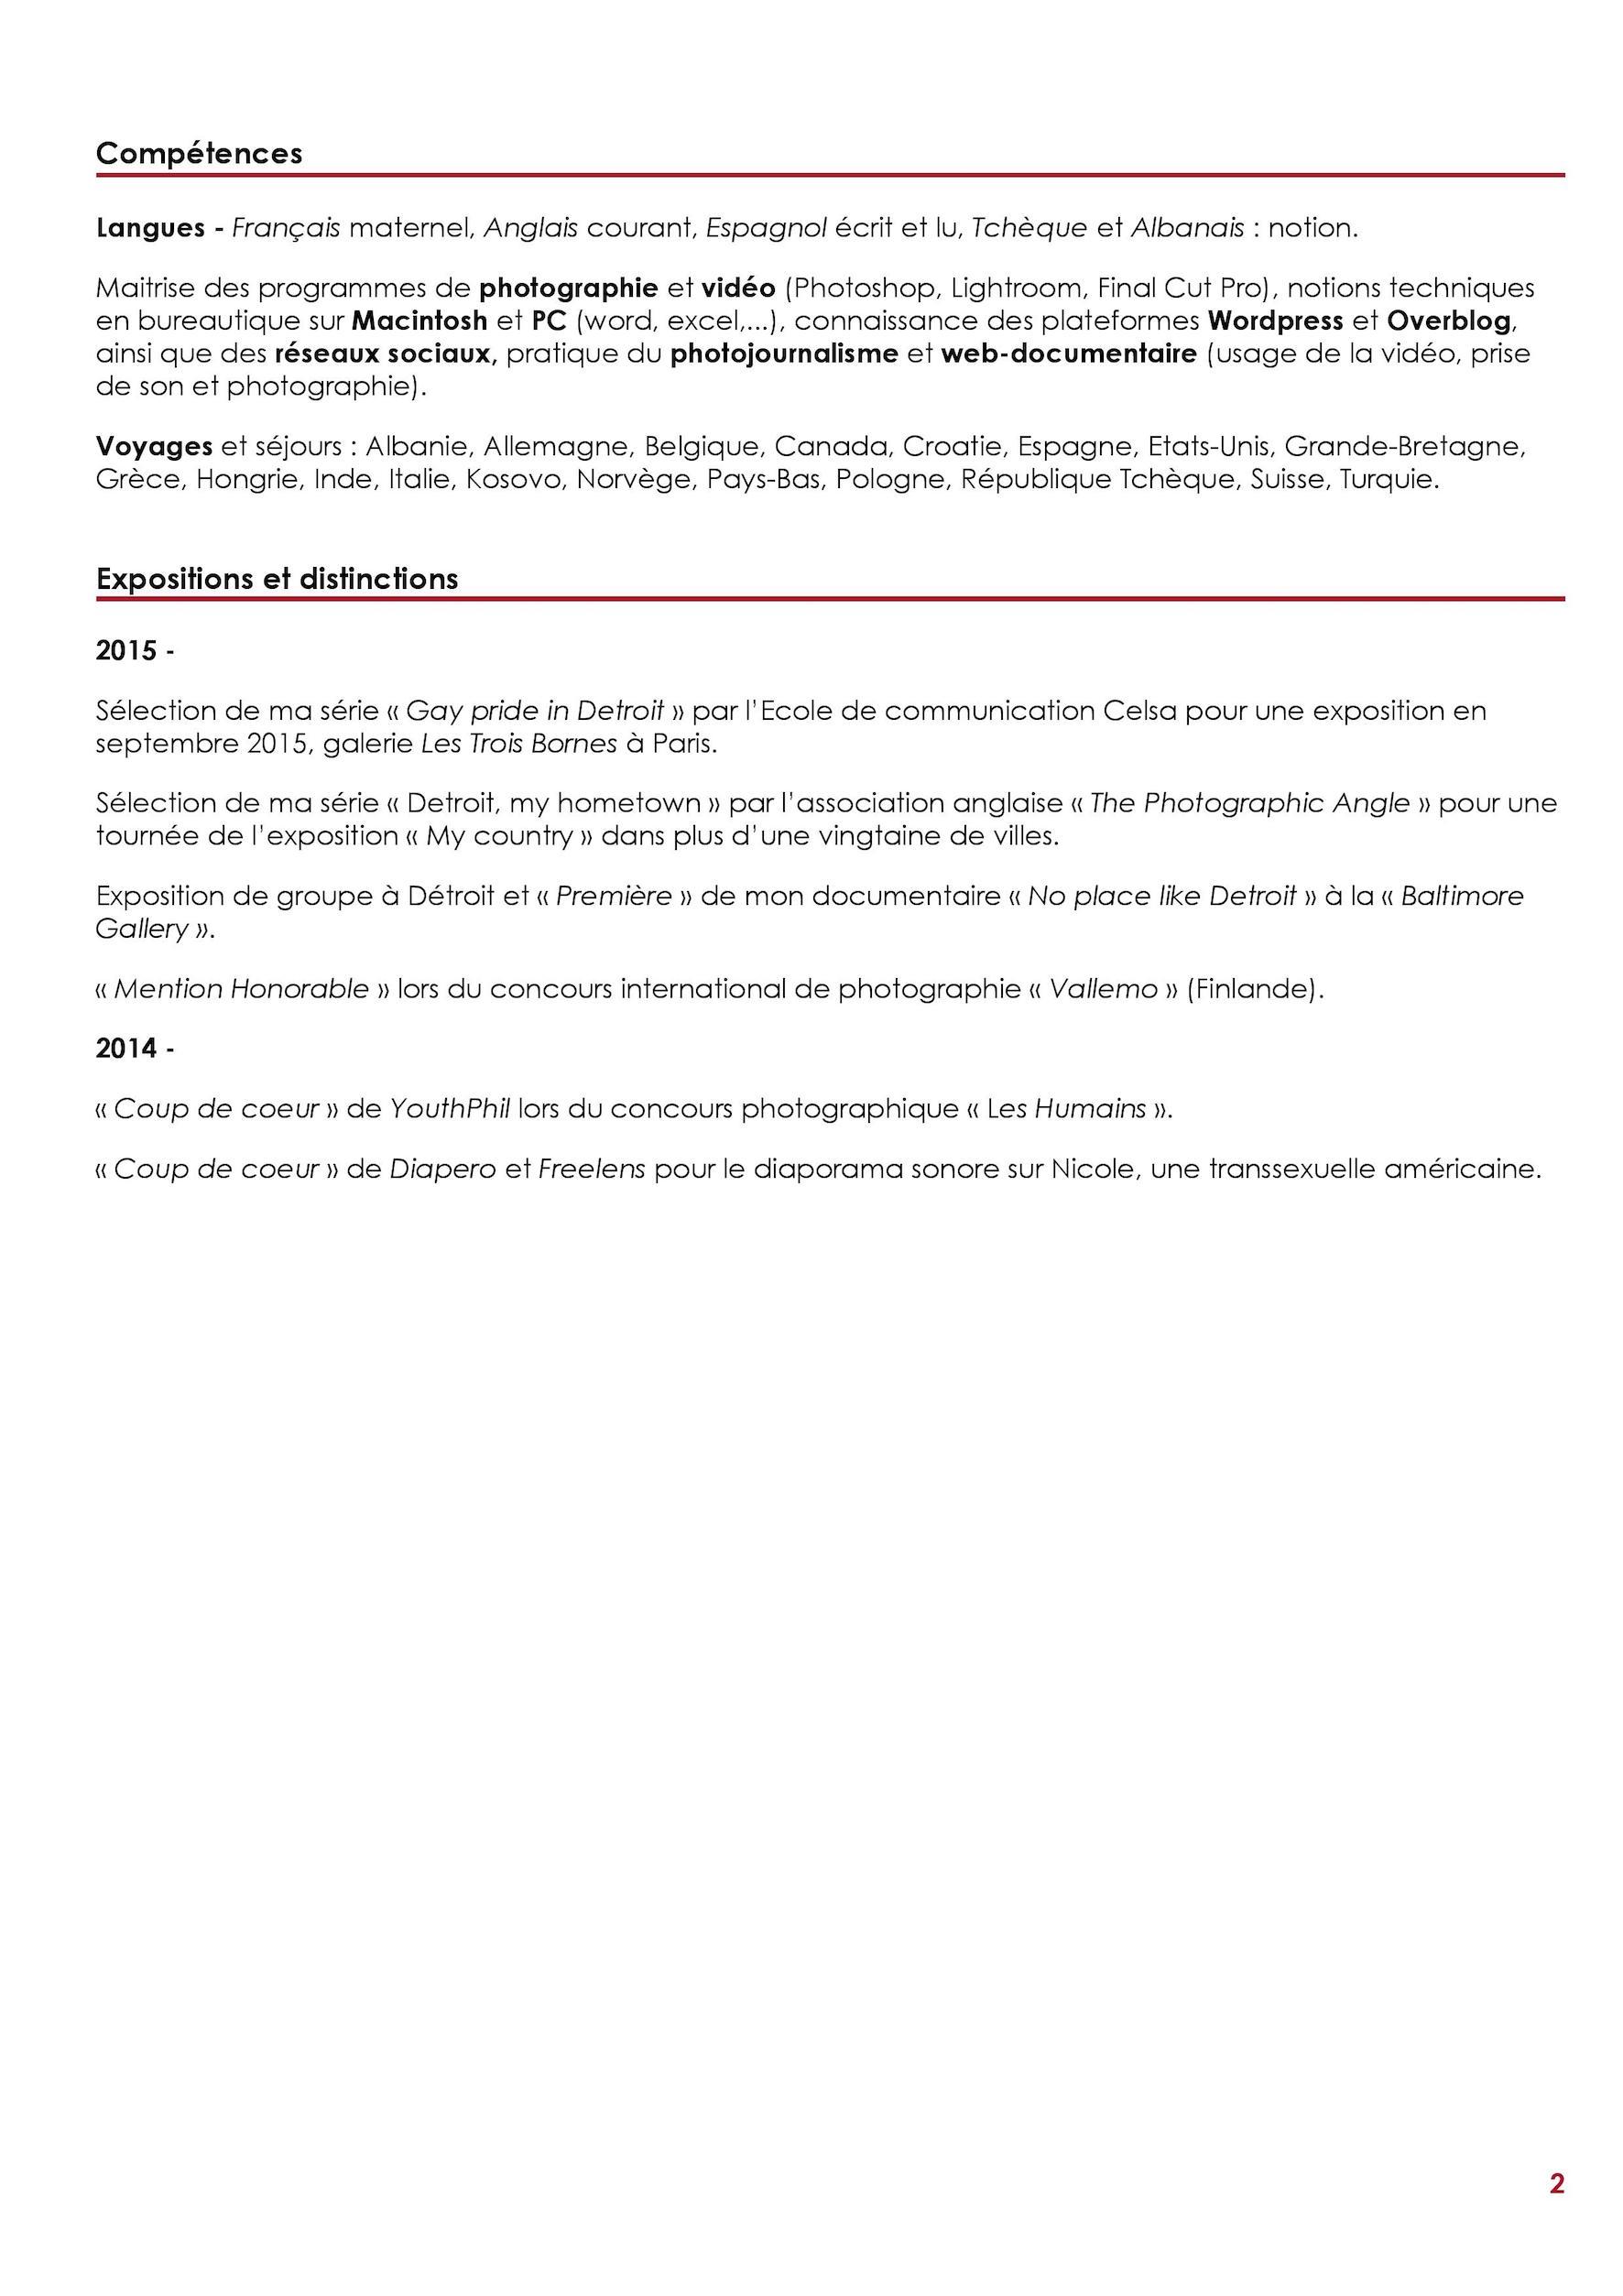 CV Nastasia Peteuil 2016-page-002